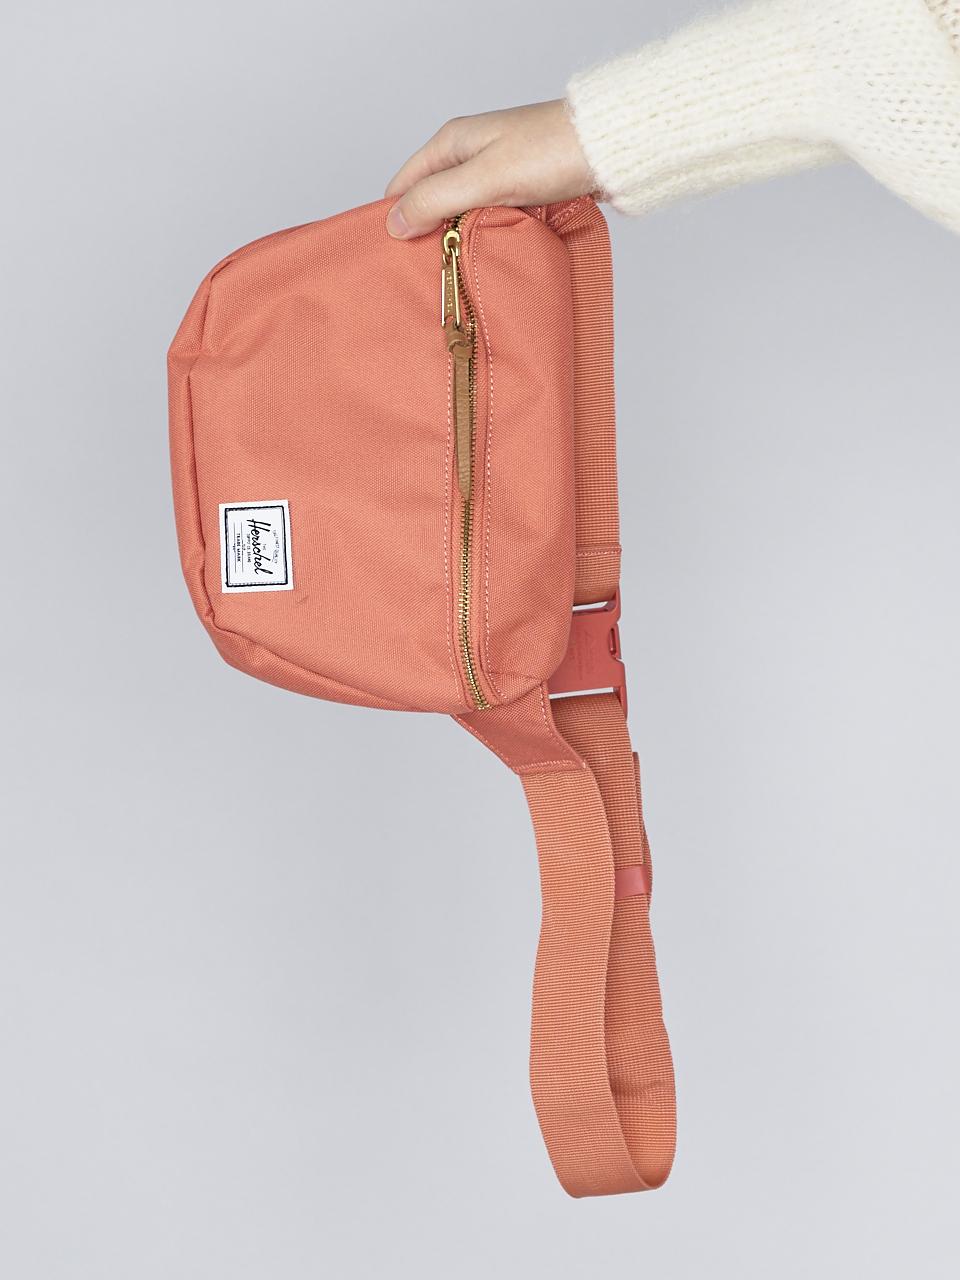 BAG FIFTEEN APRICOT BRANDY